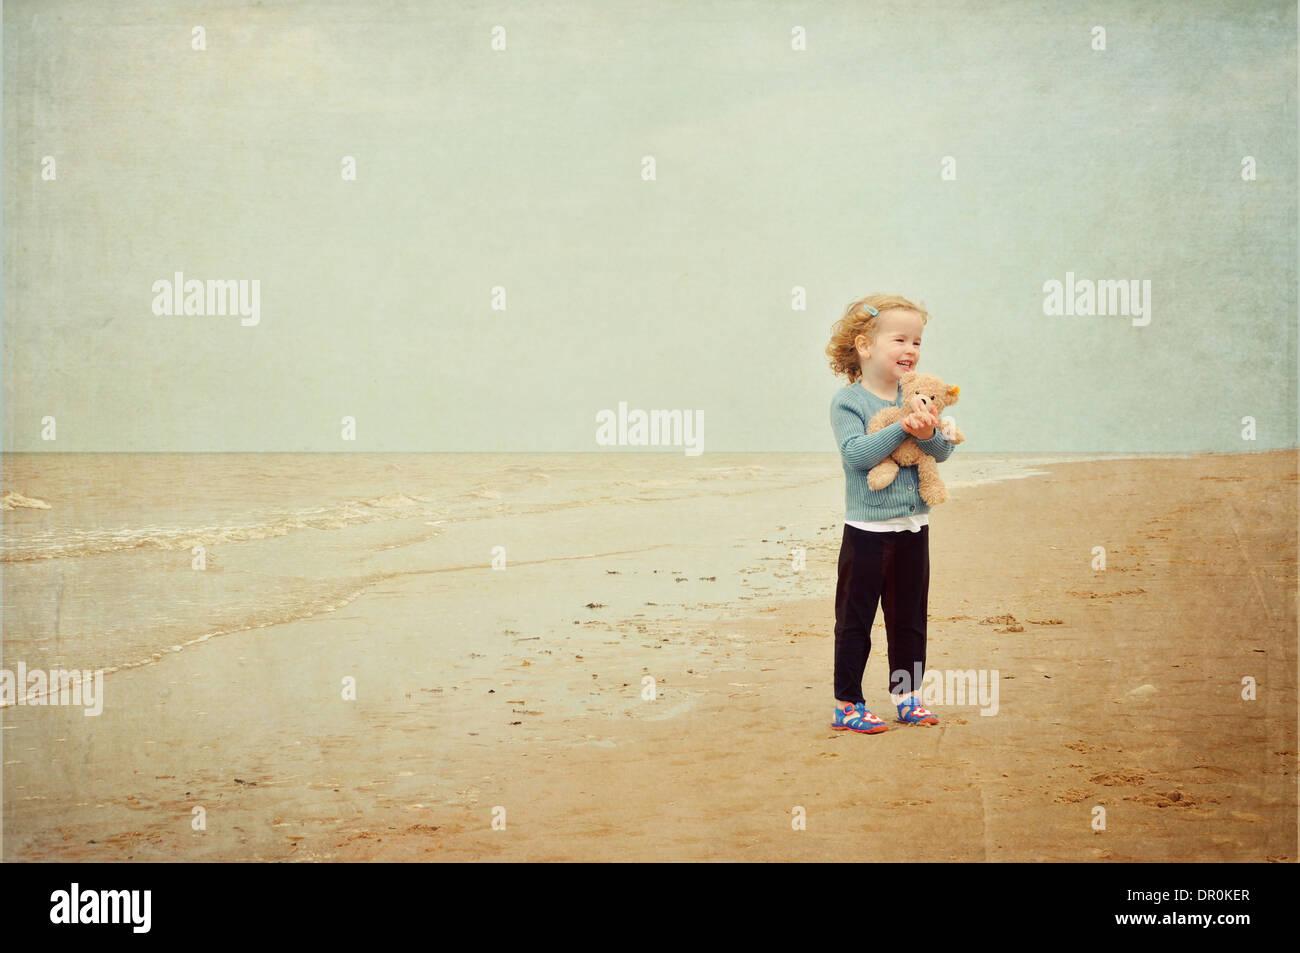 Little girl with teddy bear standing on beach Photo Stock